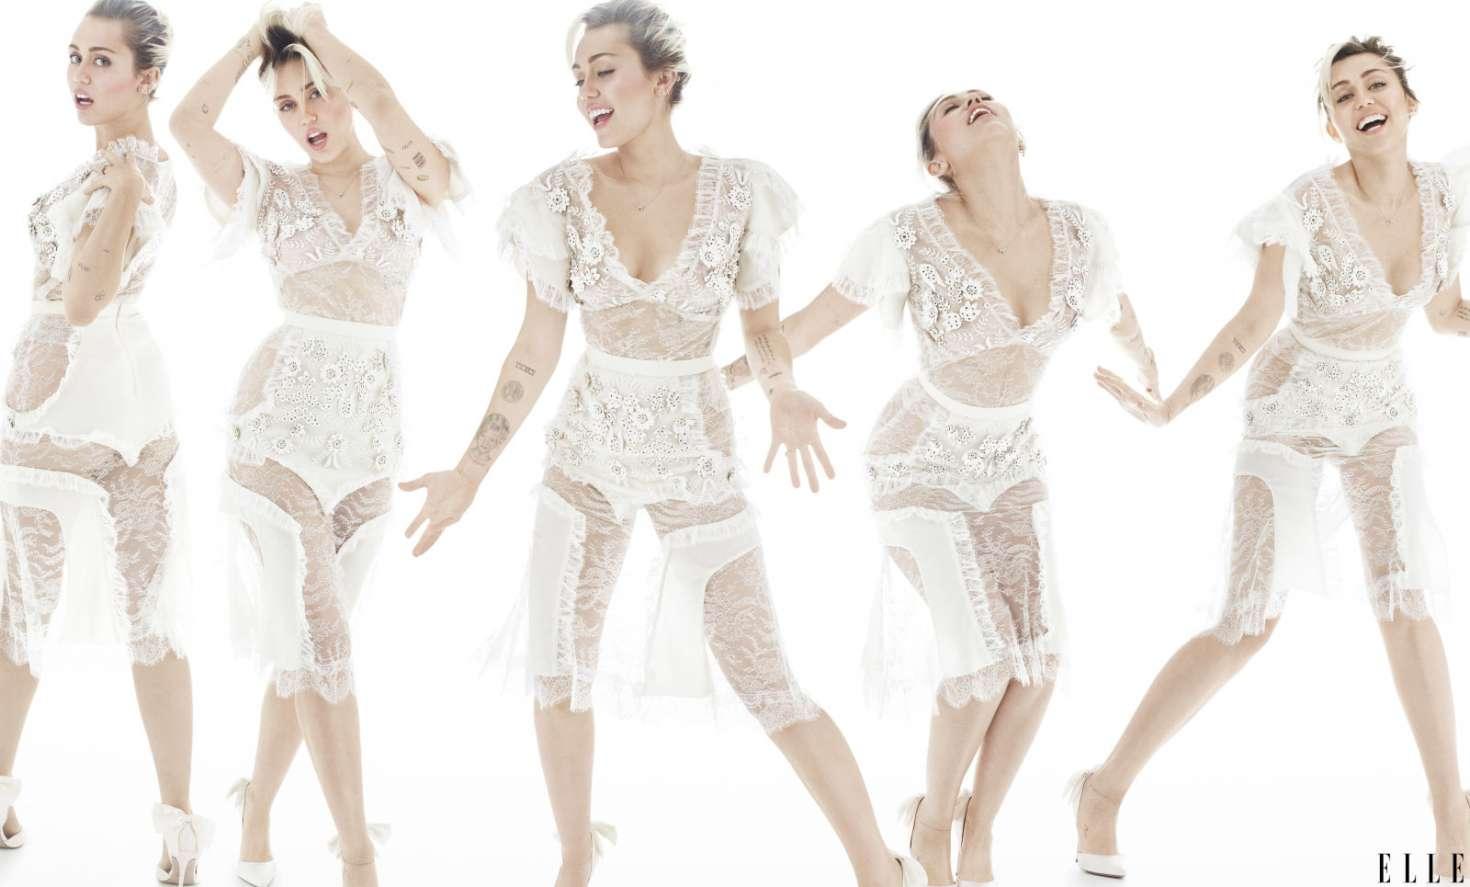 Miley Cyrus 2016 : Miley Cyrus: Elle Magazine 2016 -17